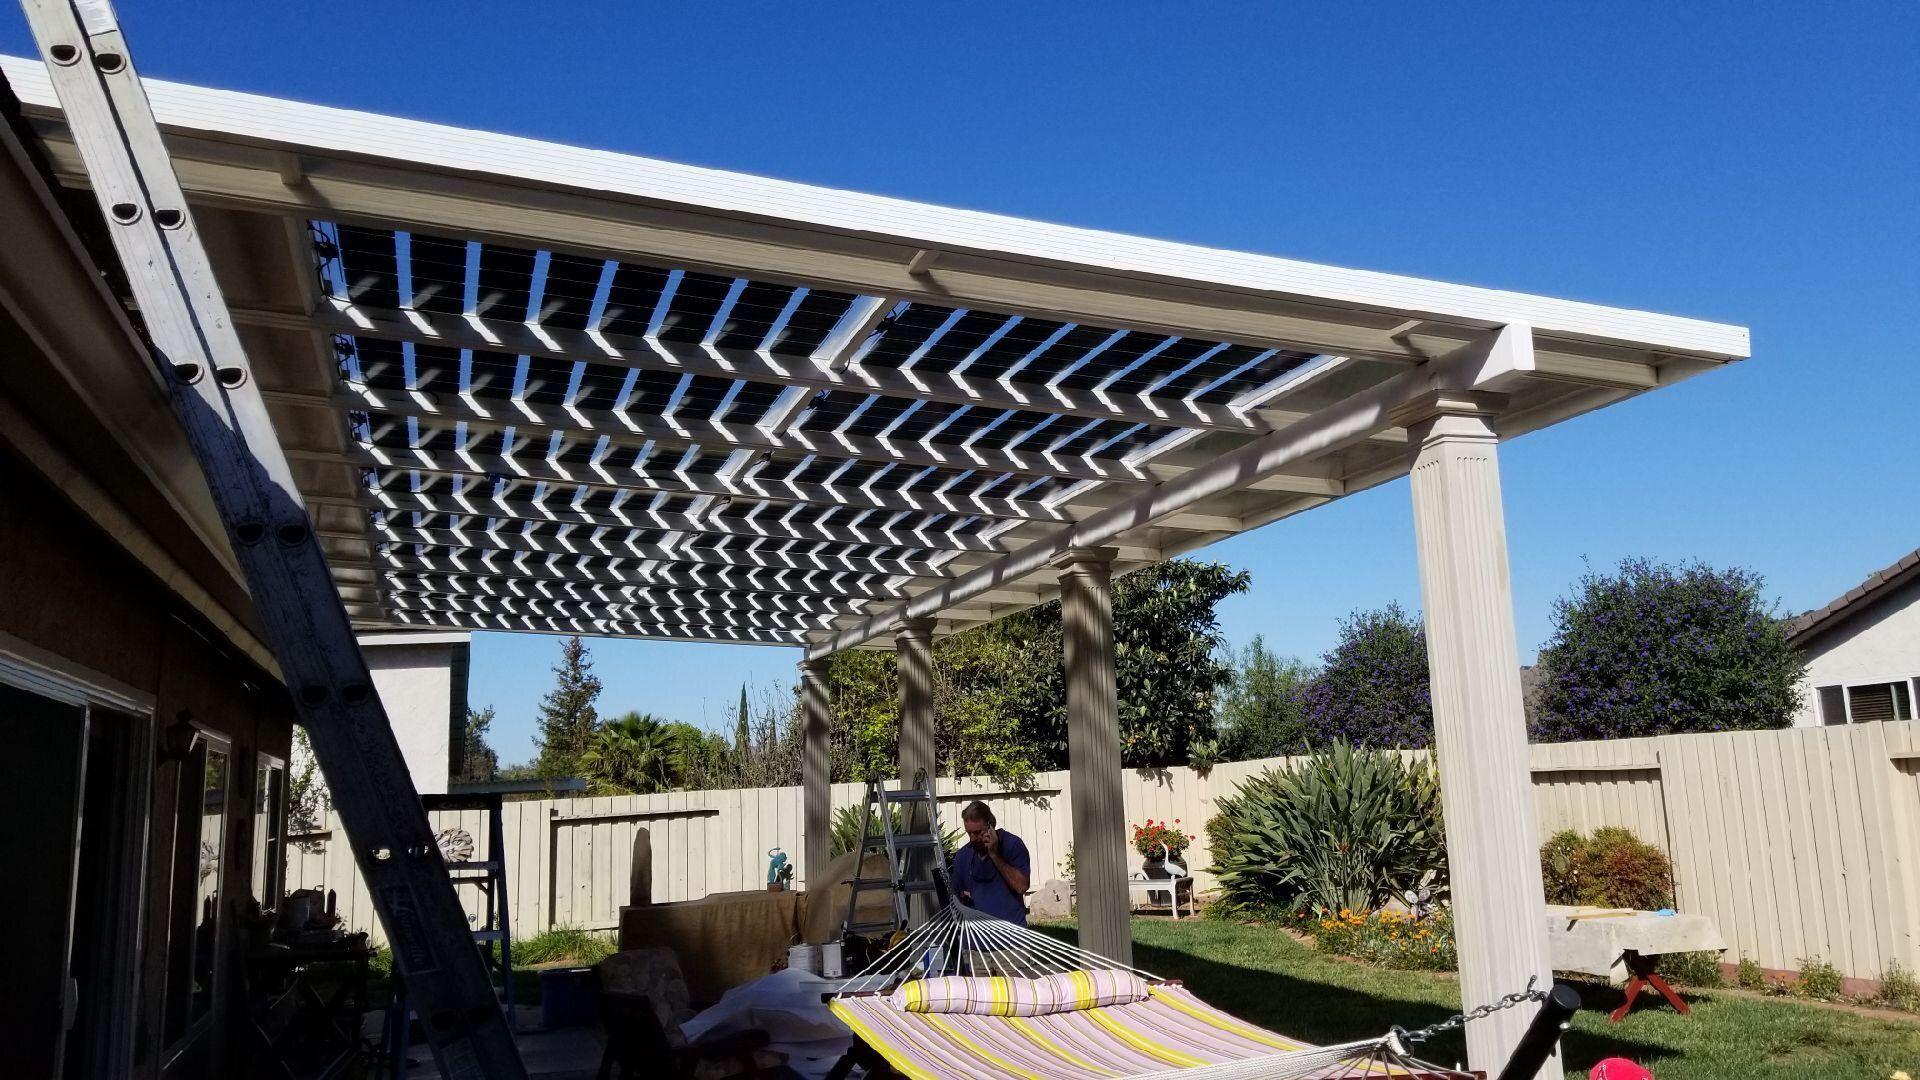 glass solar panel patio cover pergola